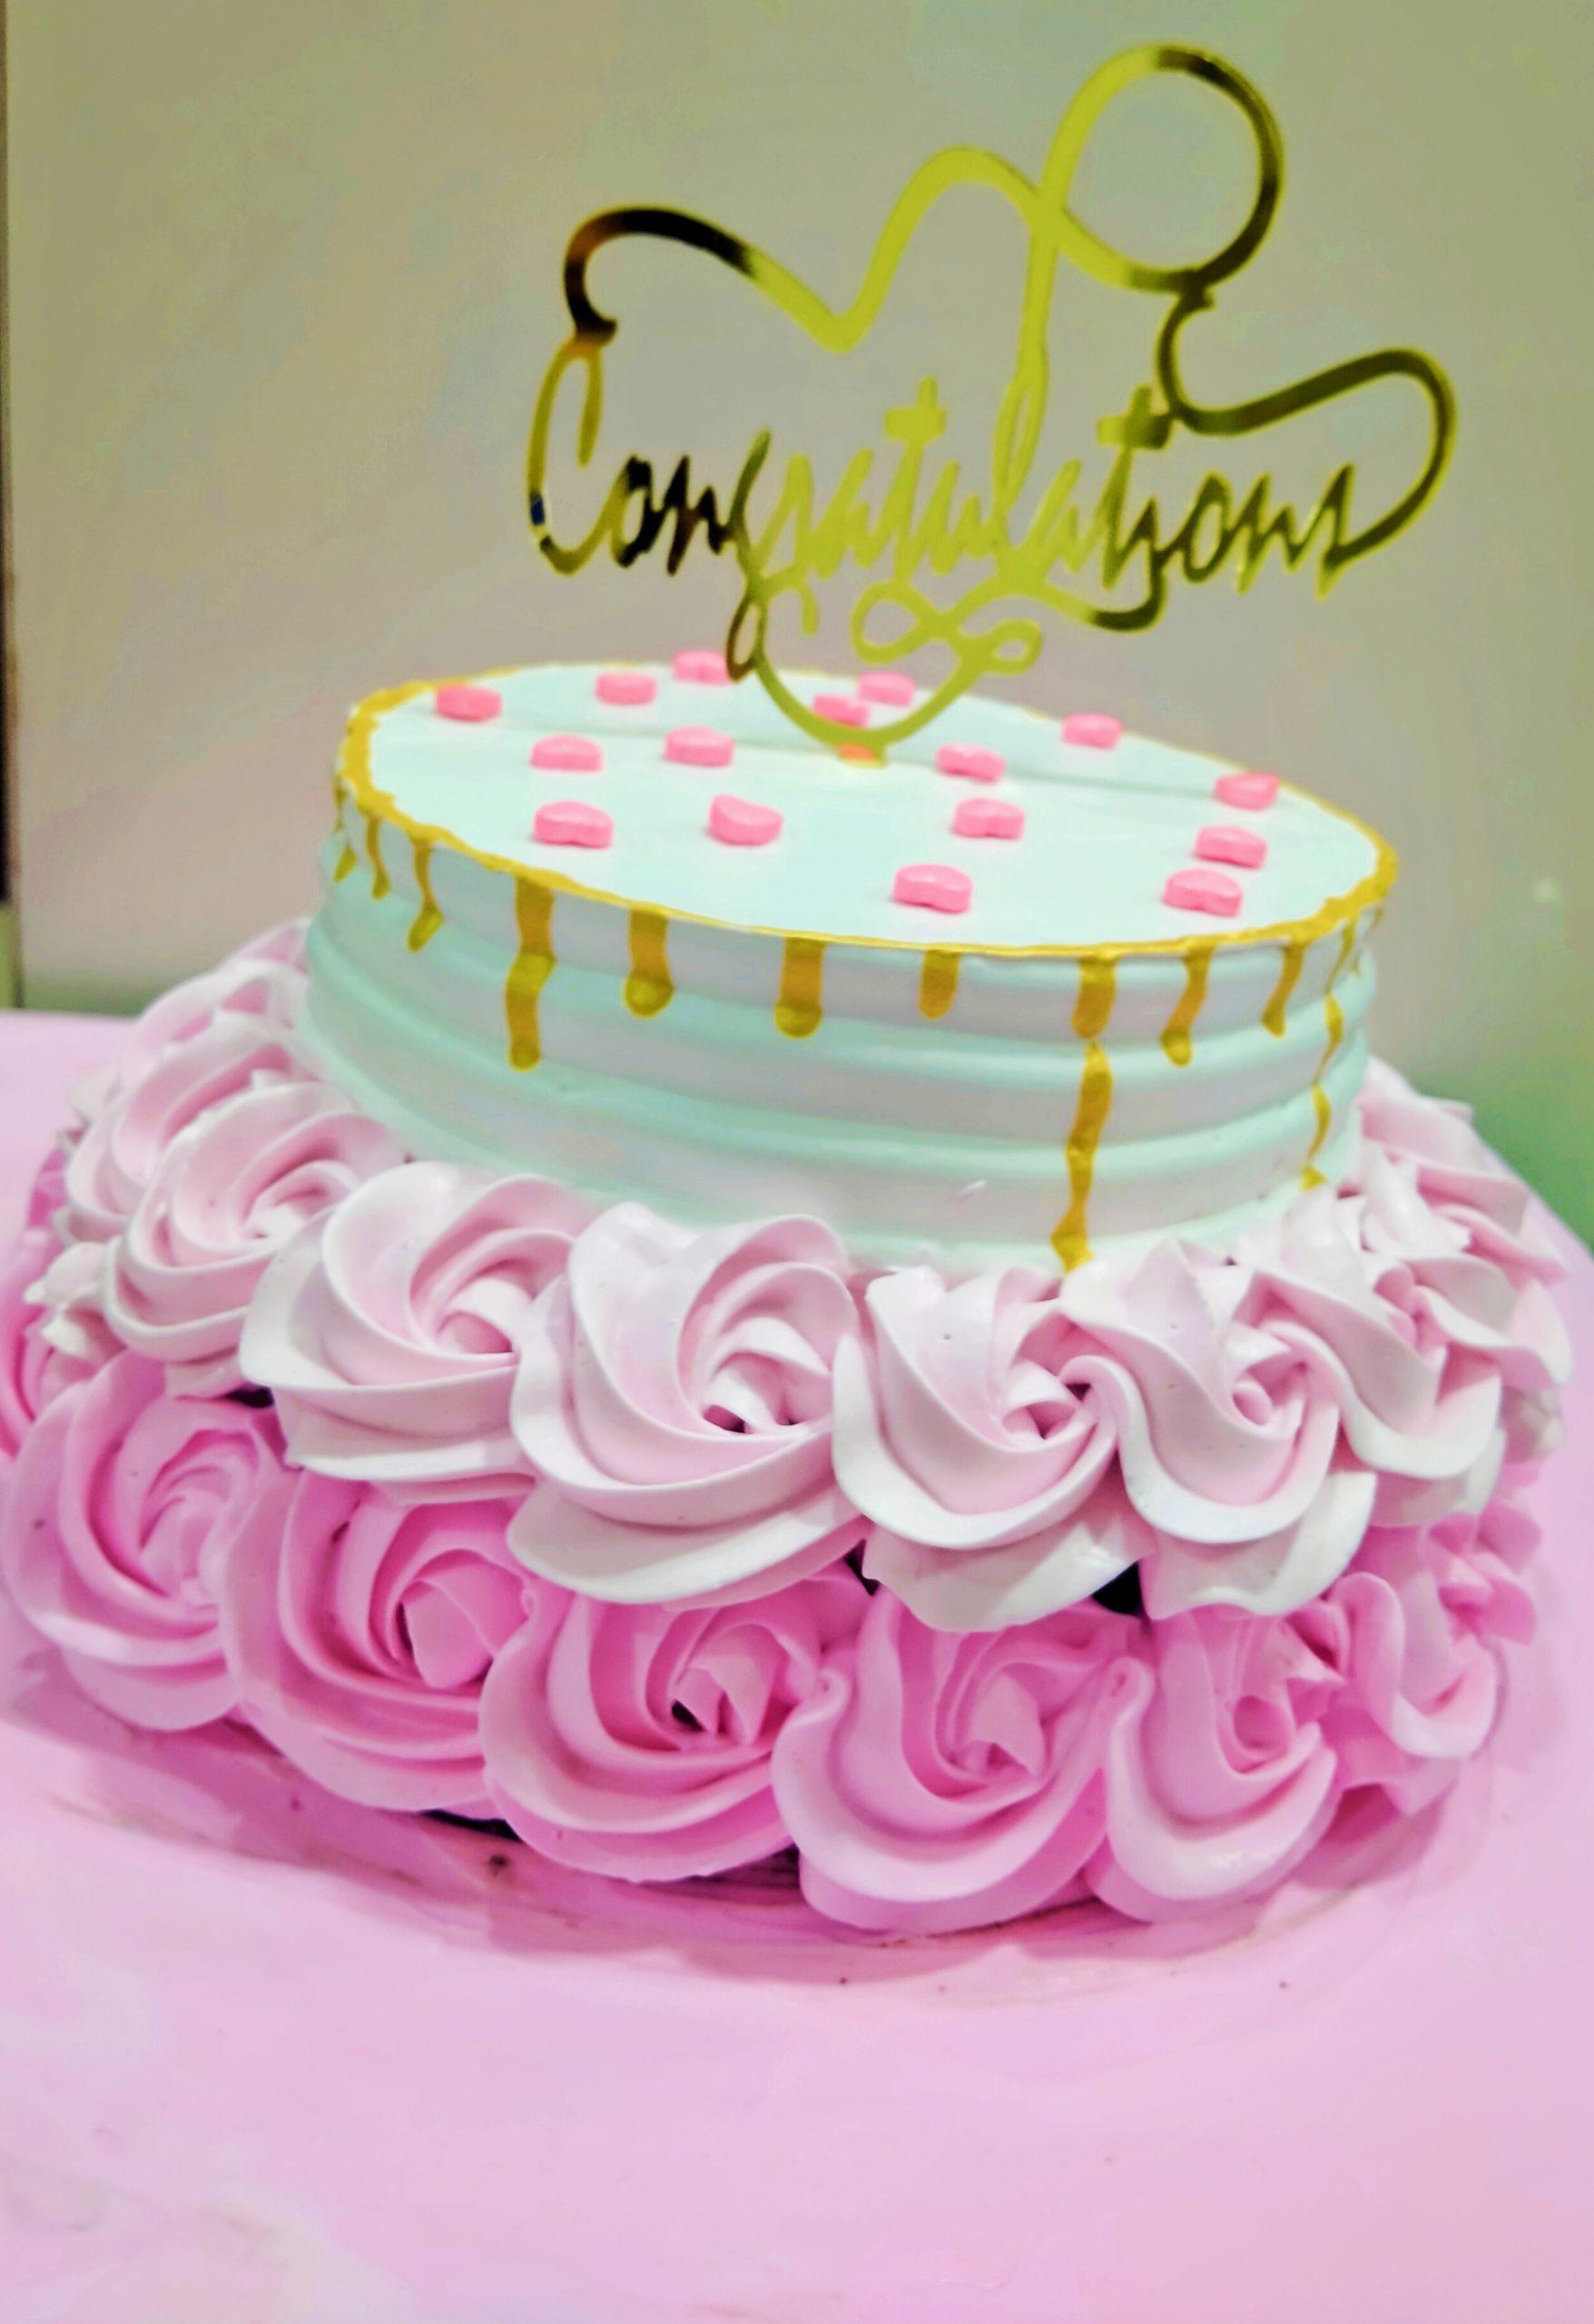 2 Tier Cake Designs, Images, Price Near Me